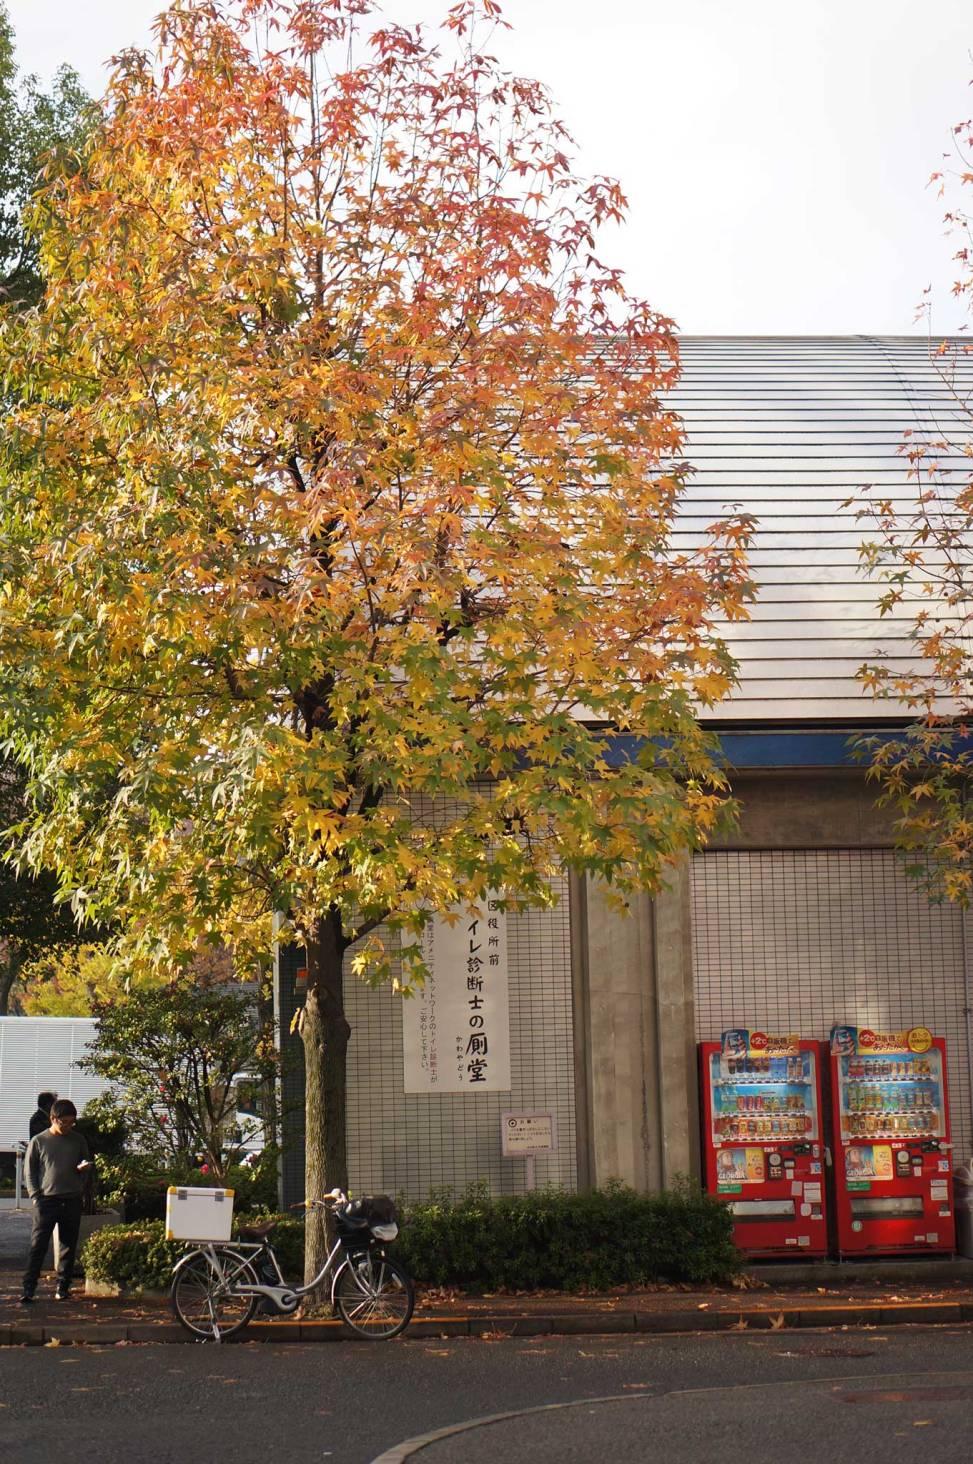 acer tree, Koen-dory, Shibuya